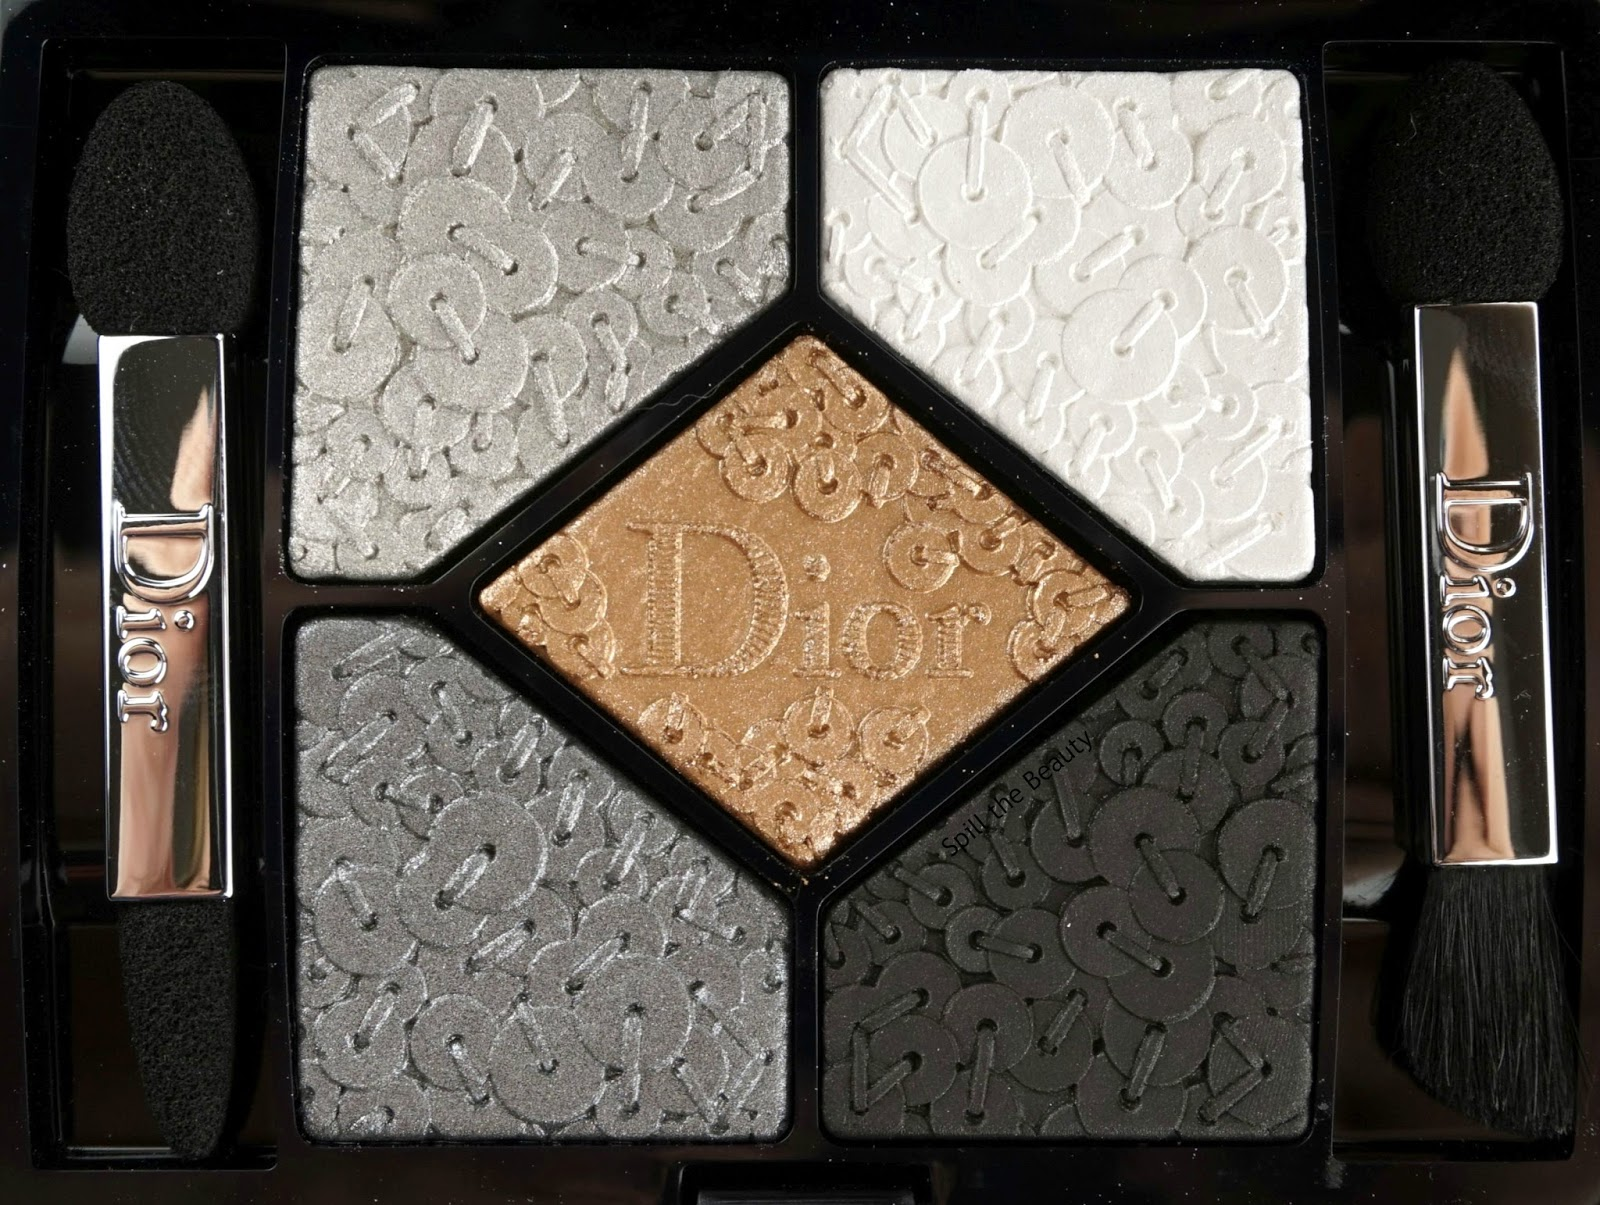 dior holiday makeup 2016 9 review swatch 5 couleurs splendor palette smoky sequins